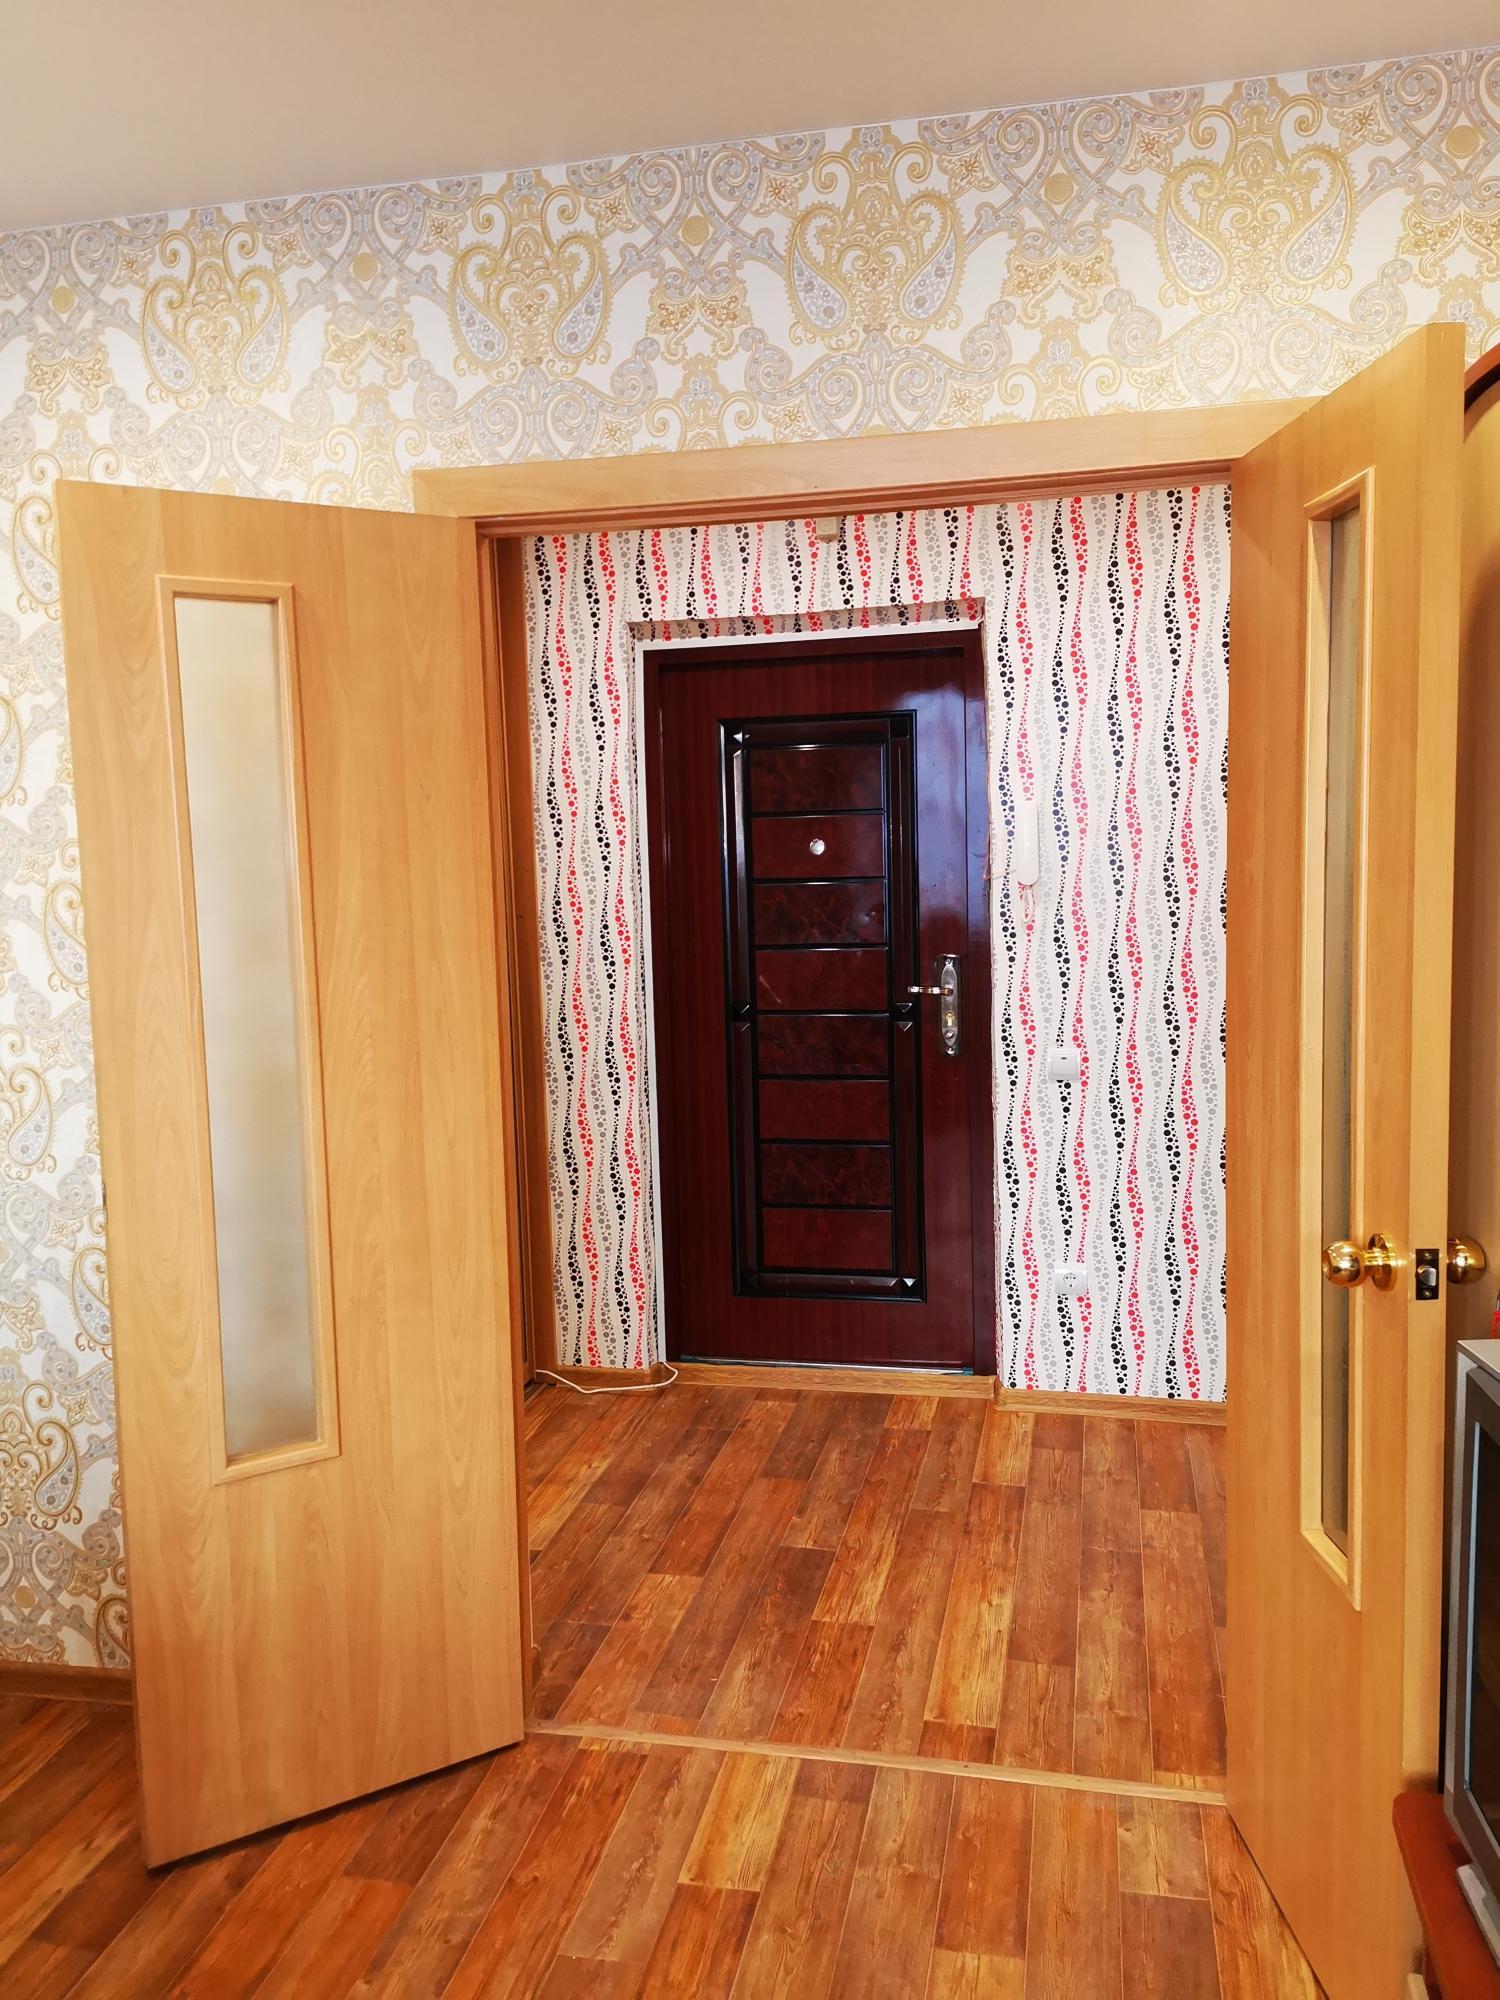 1к квартира Ястынское поле, улица Мате Залки, 37 | 16000 | аренда в Красноярске фото 17